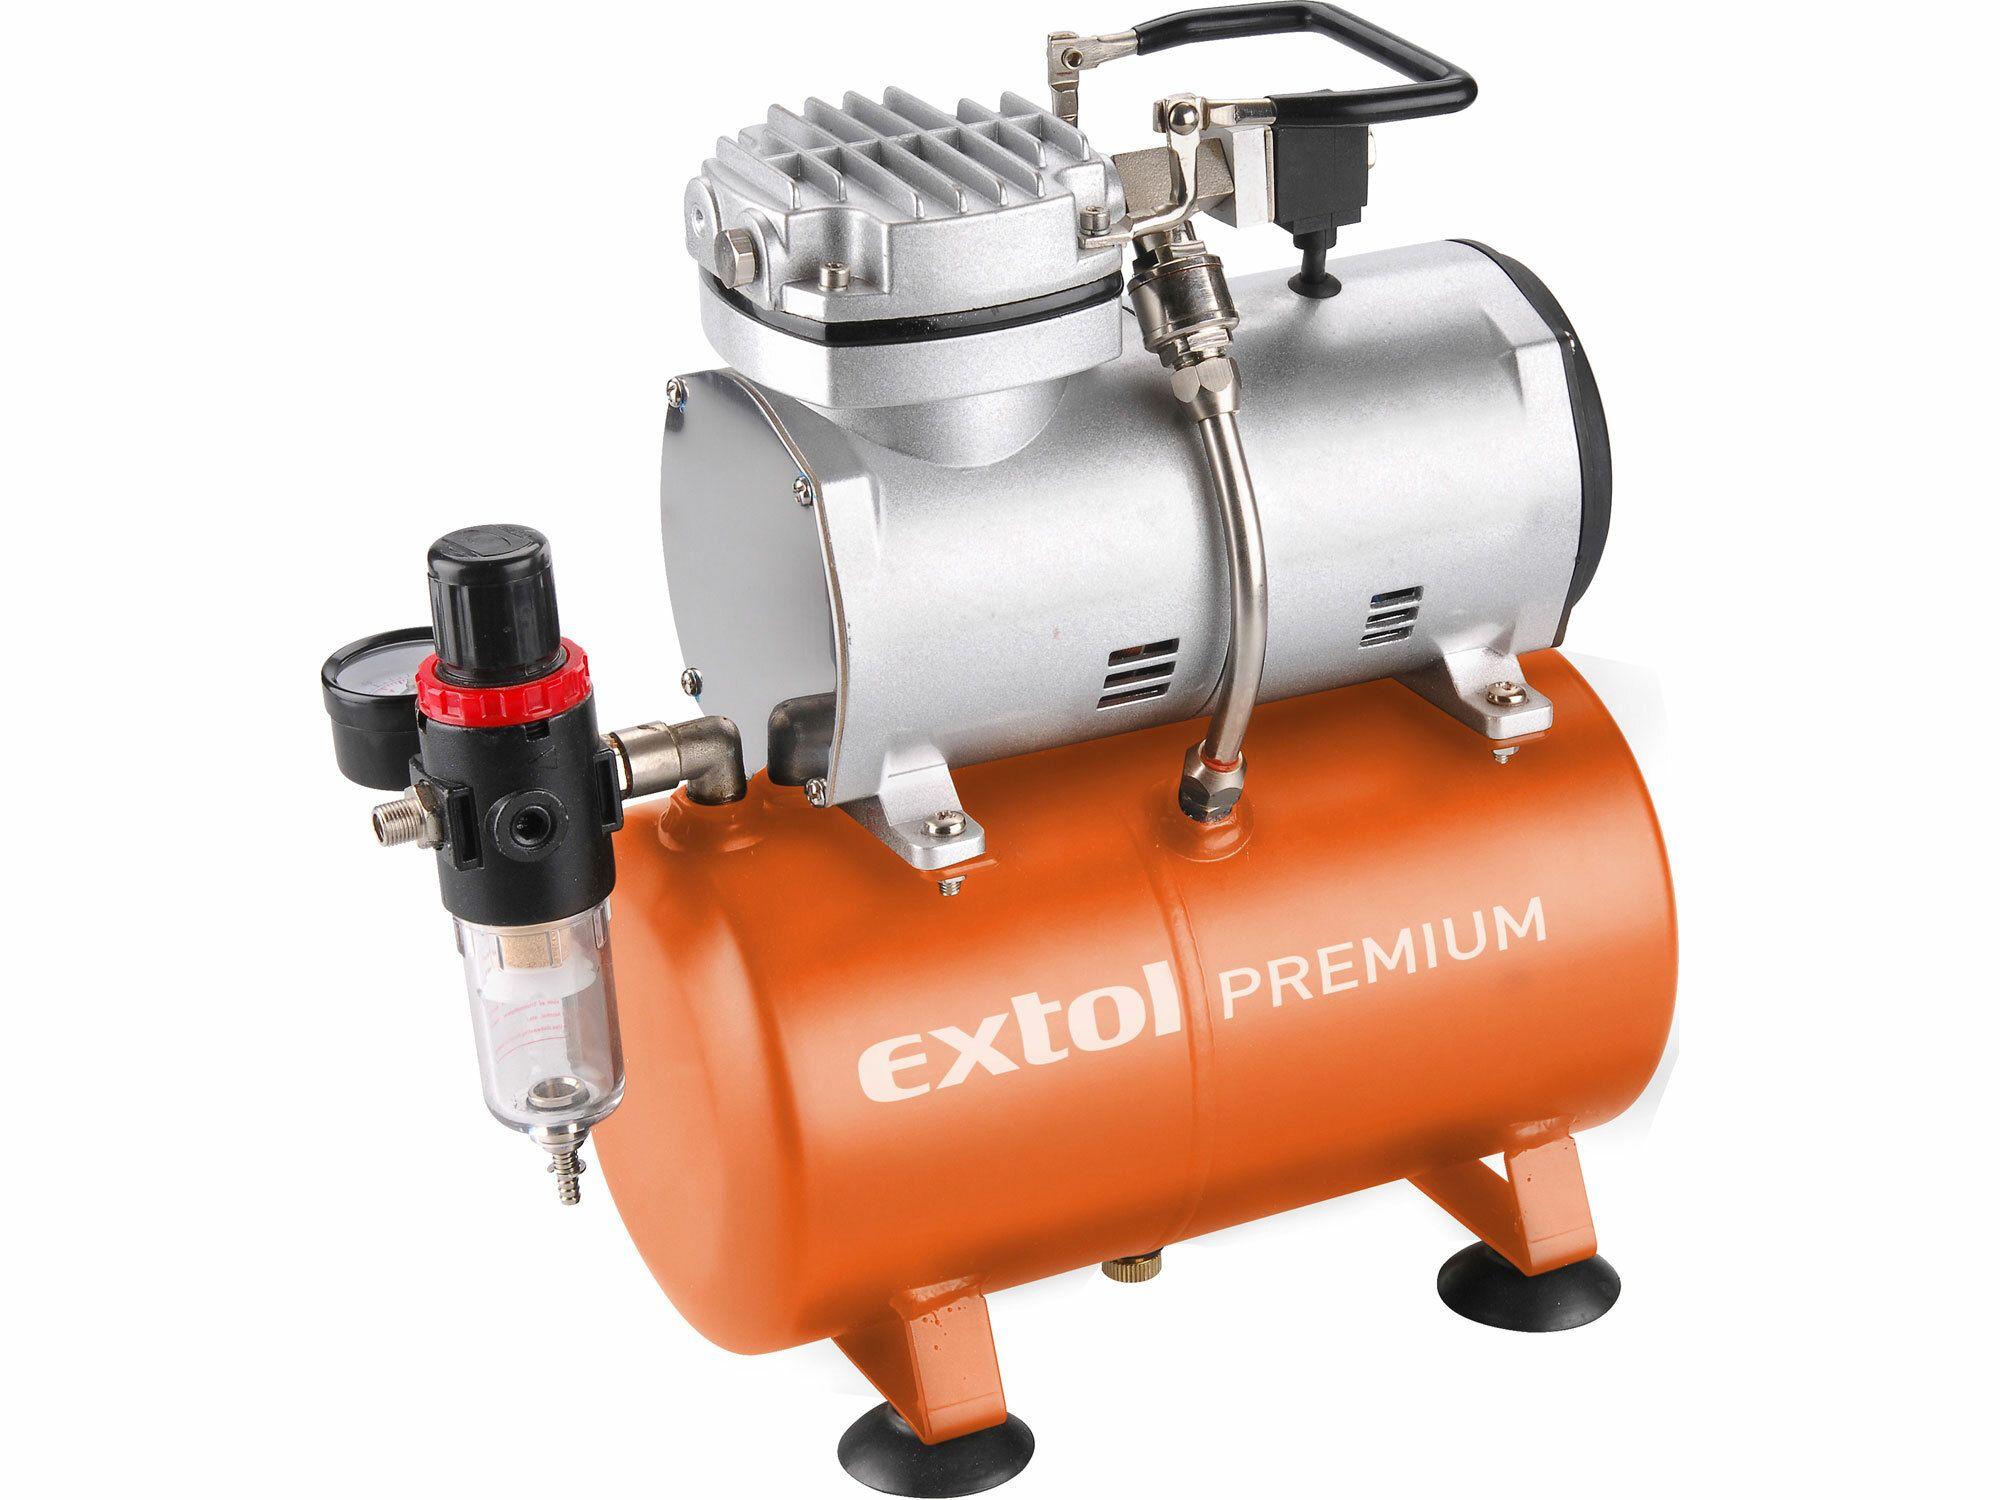 Kompresor, 150W, 3l, EXTOL PREMIUM, AC-S3, 8895300